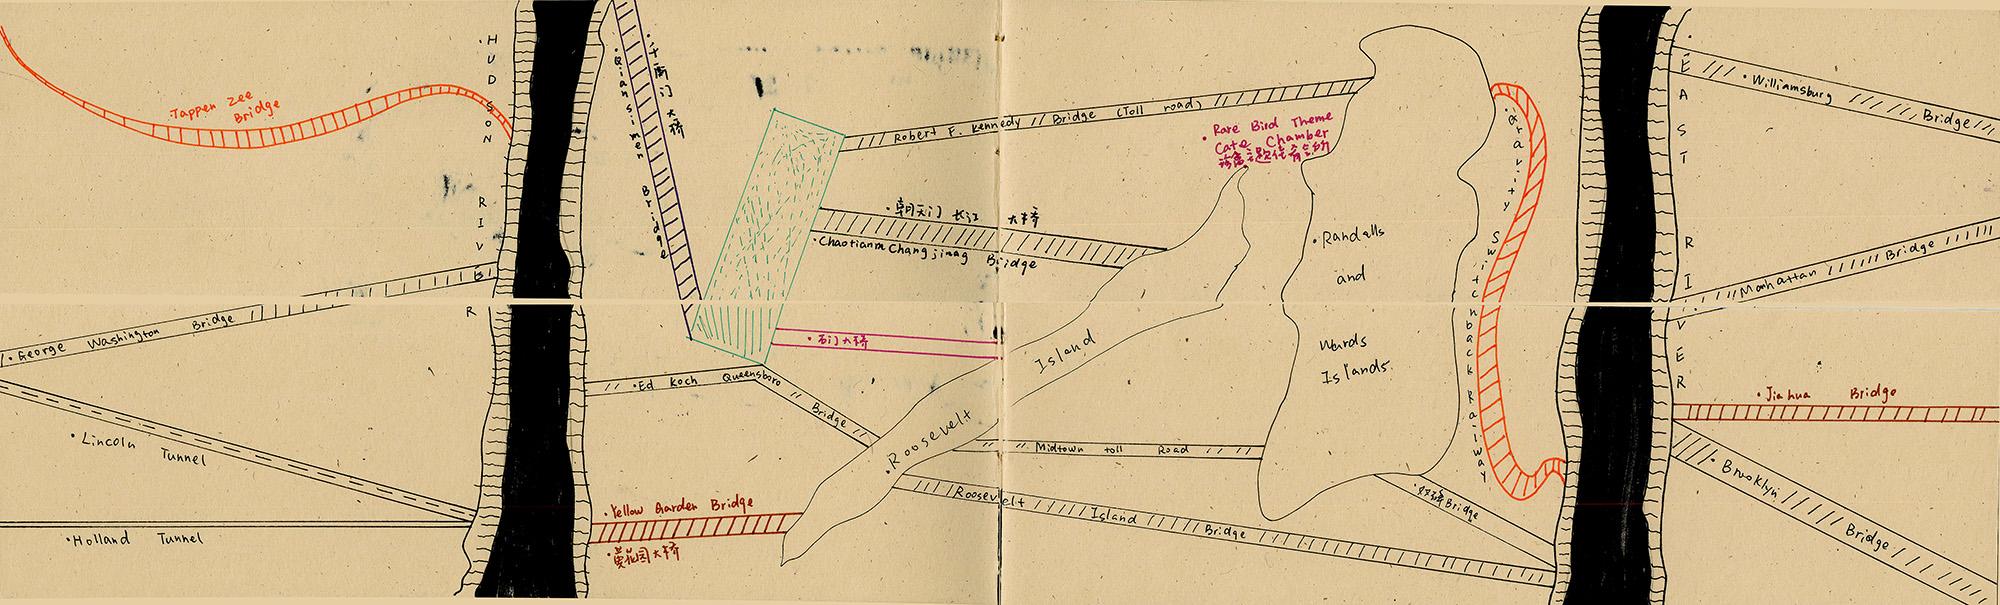 River Book I(Top), River Book II(Bottom), Page 7   Bridges Scene Bridges artificially connect ravines.